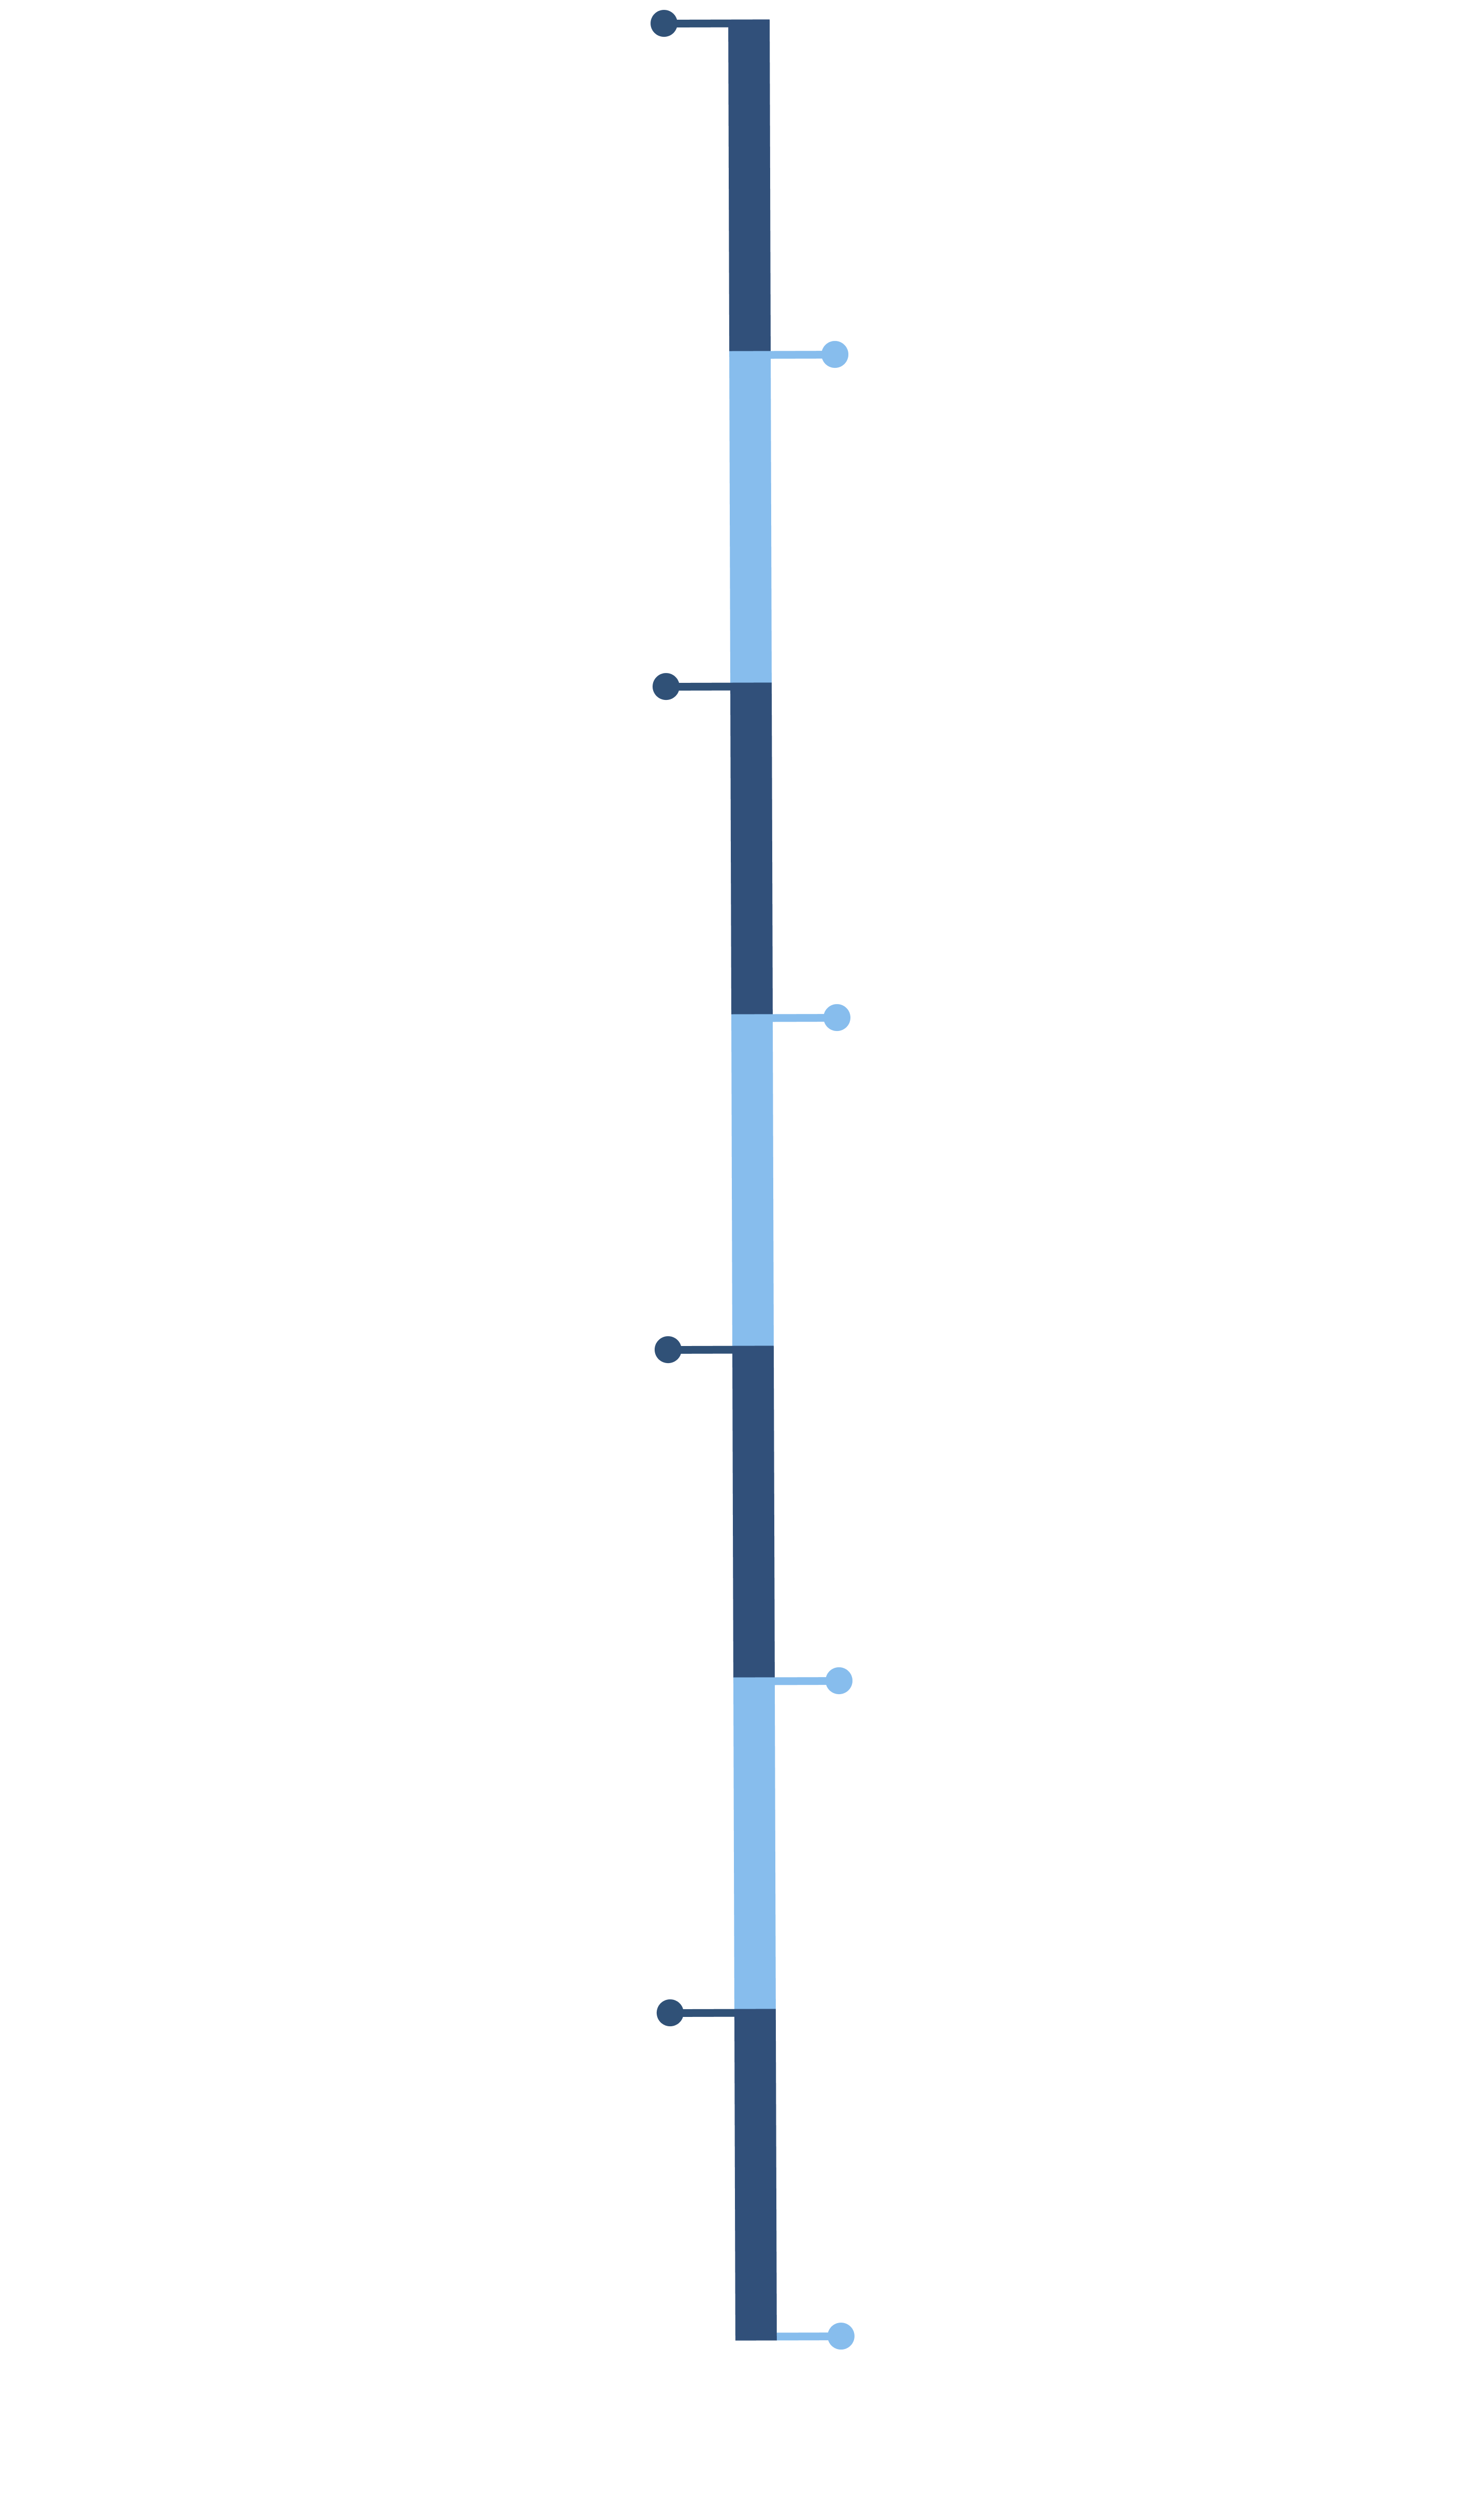 Timeline of cryptocurrency hacks